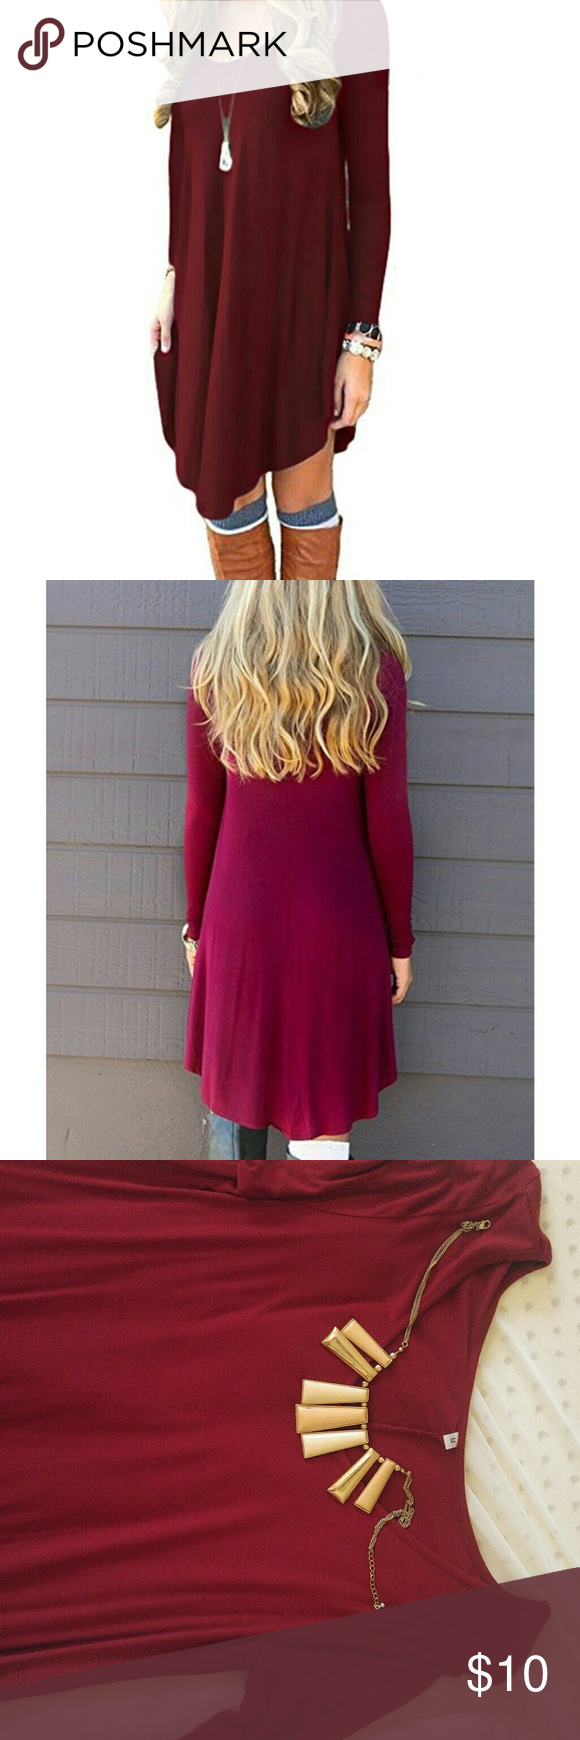 Medium sized wine colored dress wine colored dresses medium long